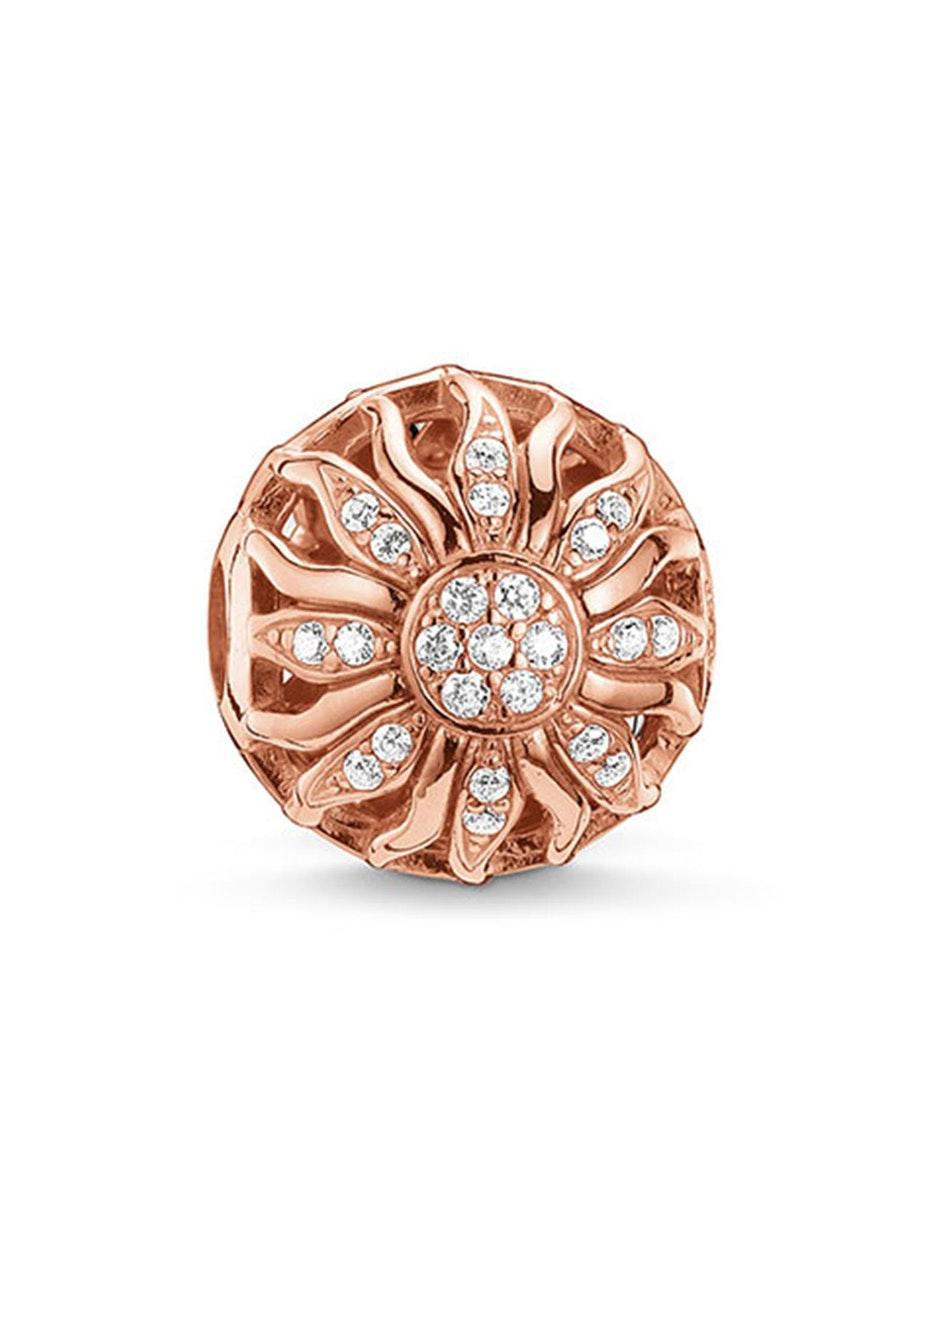 Thomas Sabo  - Karma Bead - Rose Gold Plated Cz Sun